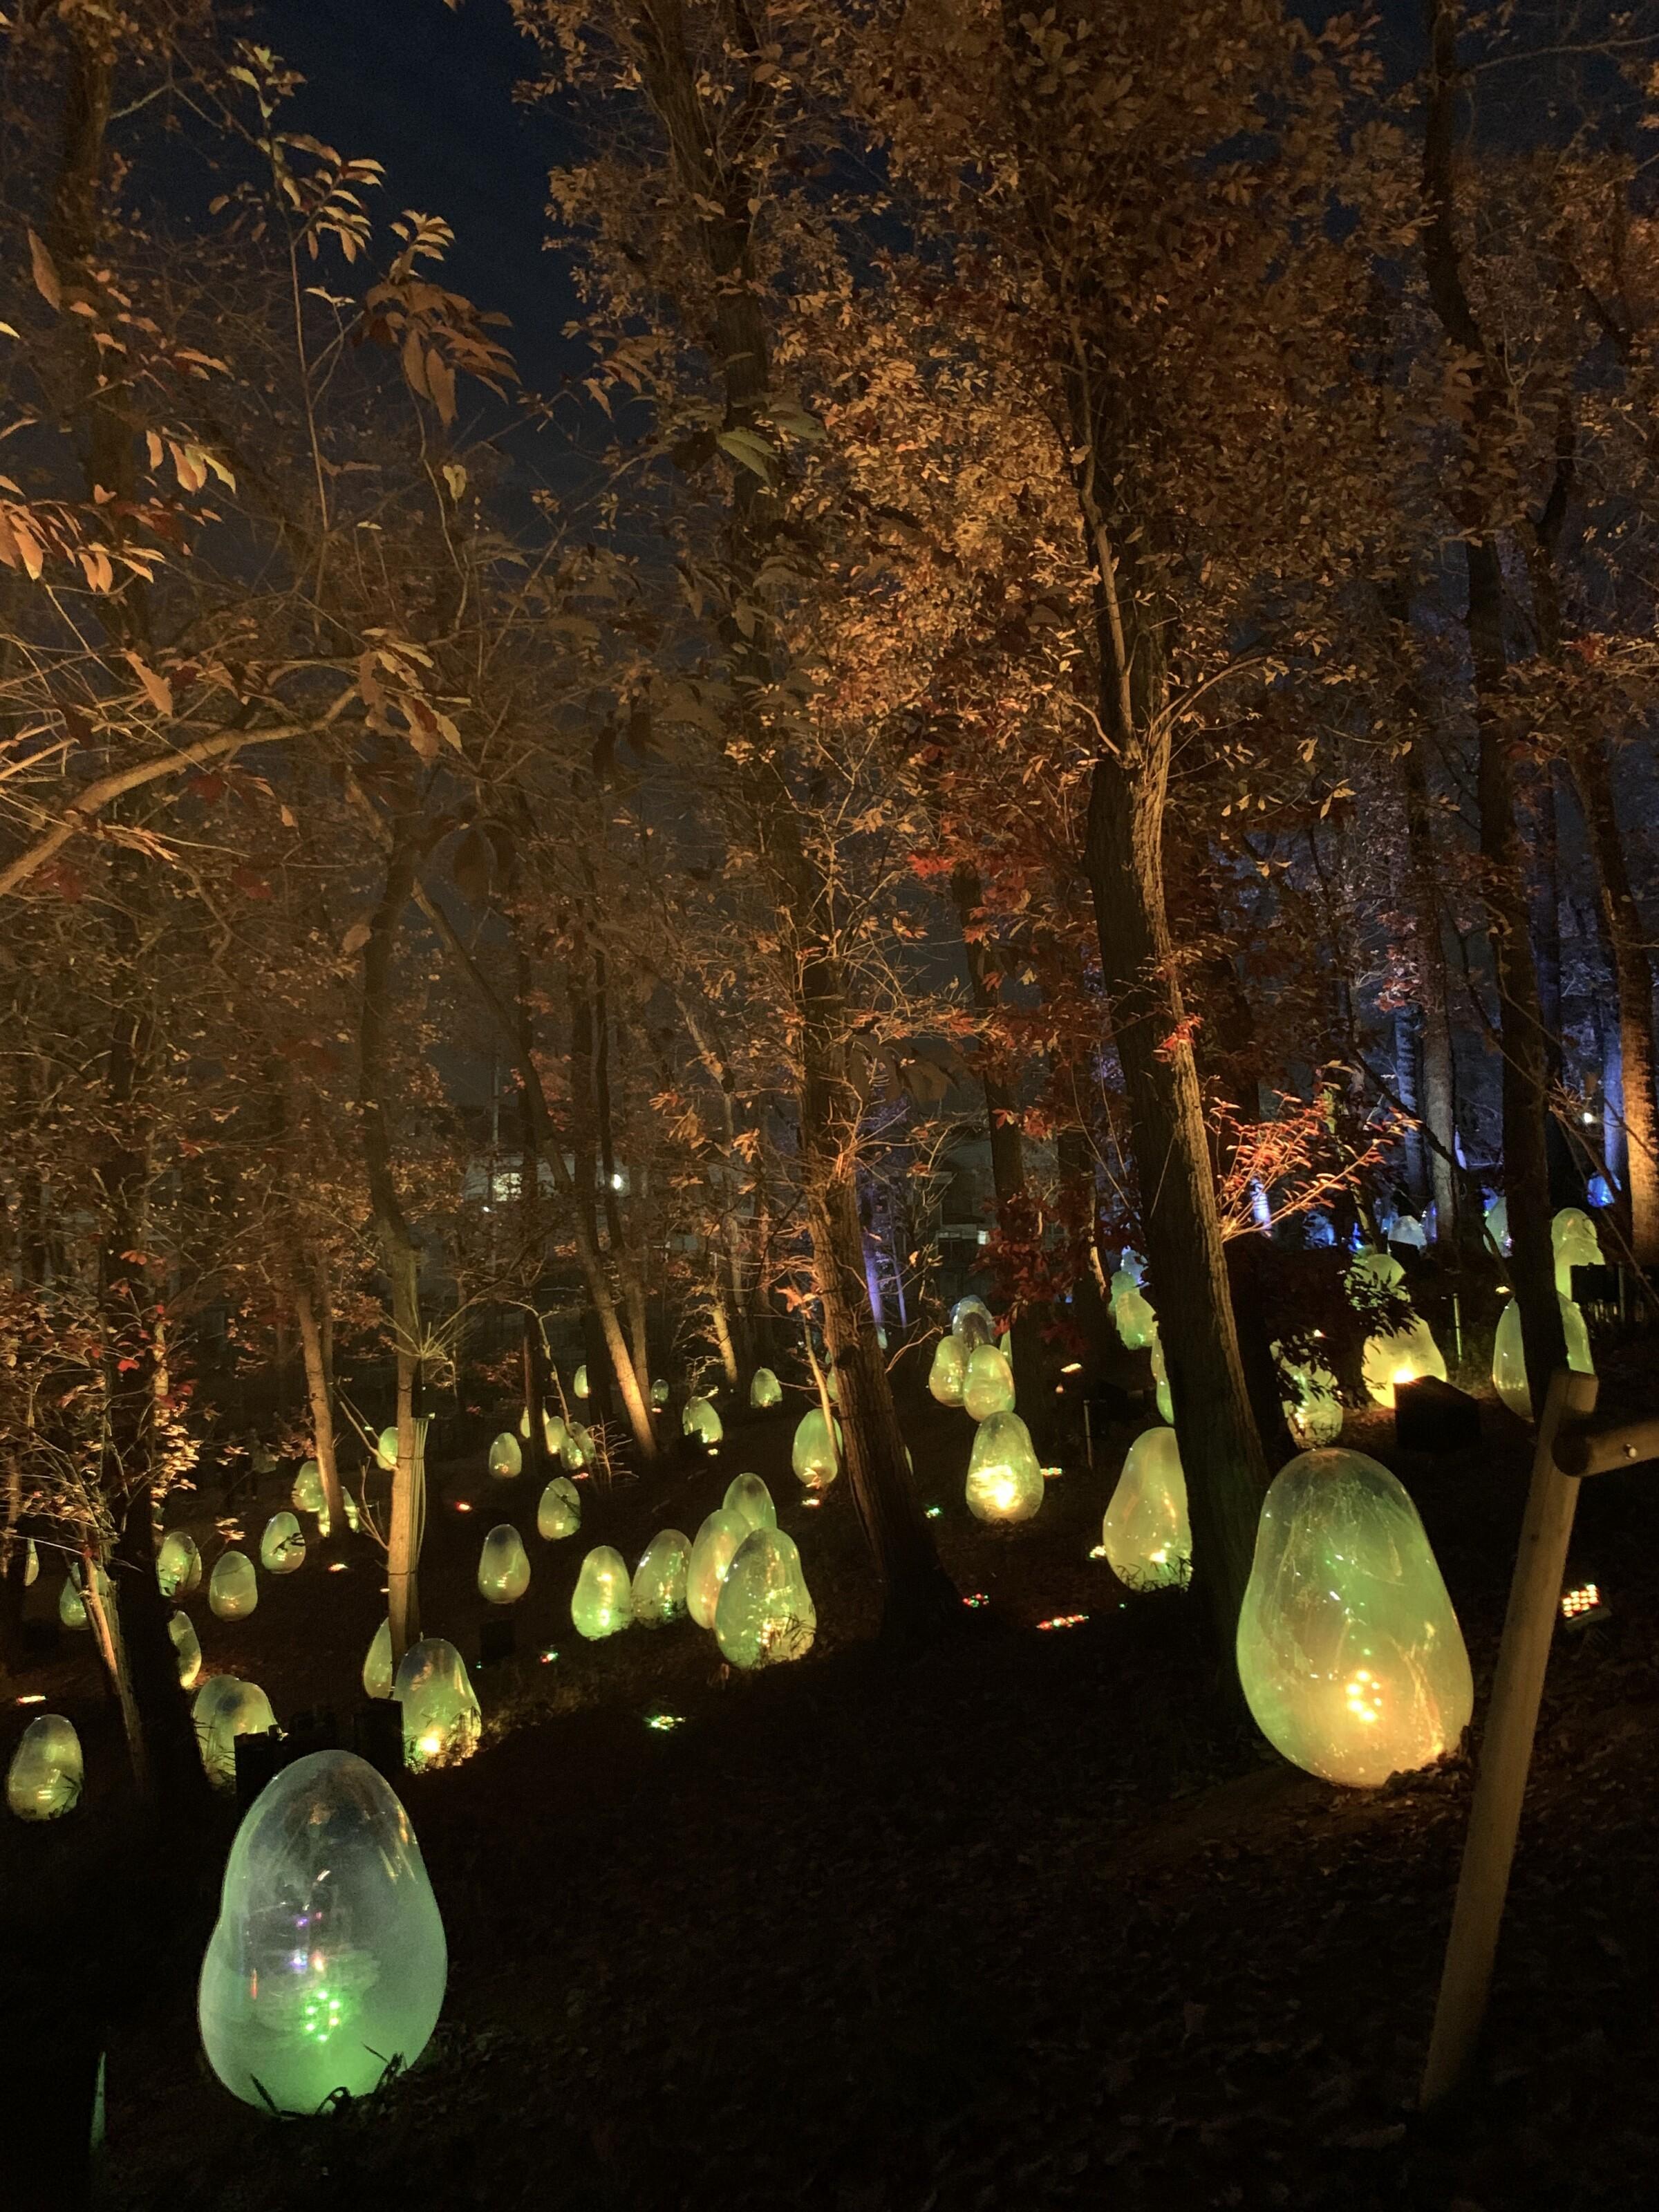 The Acorn Forest teamLab exhibit